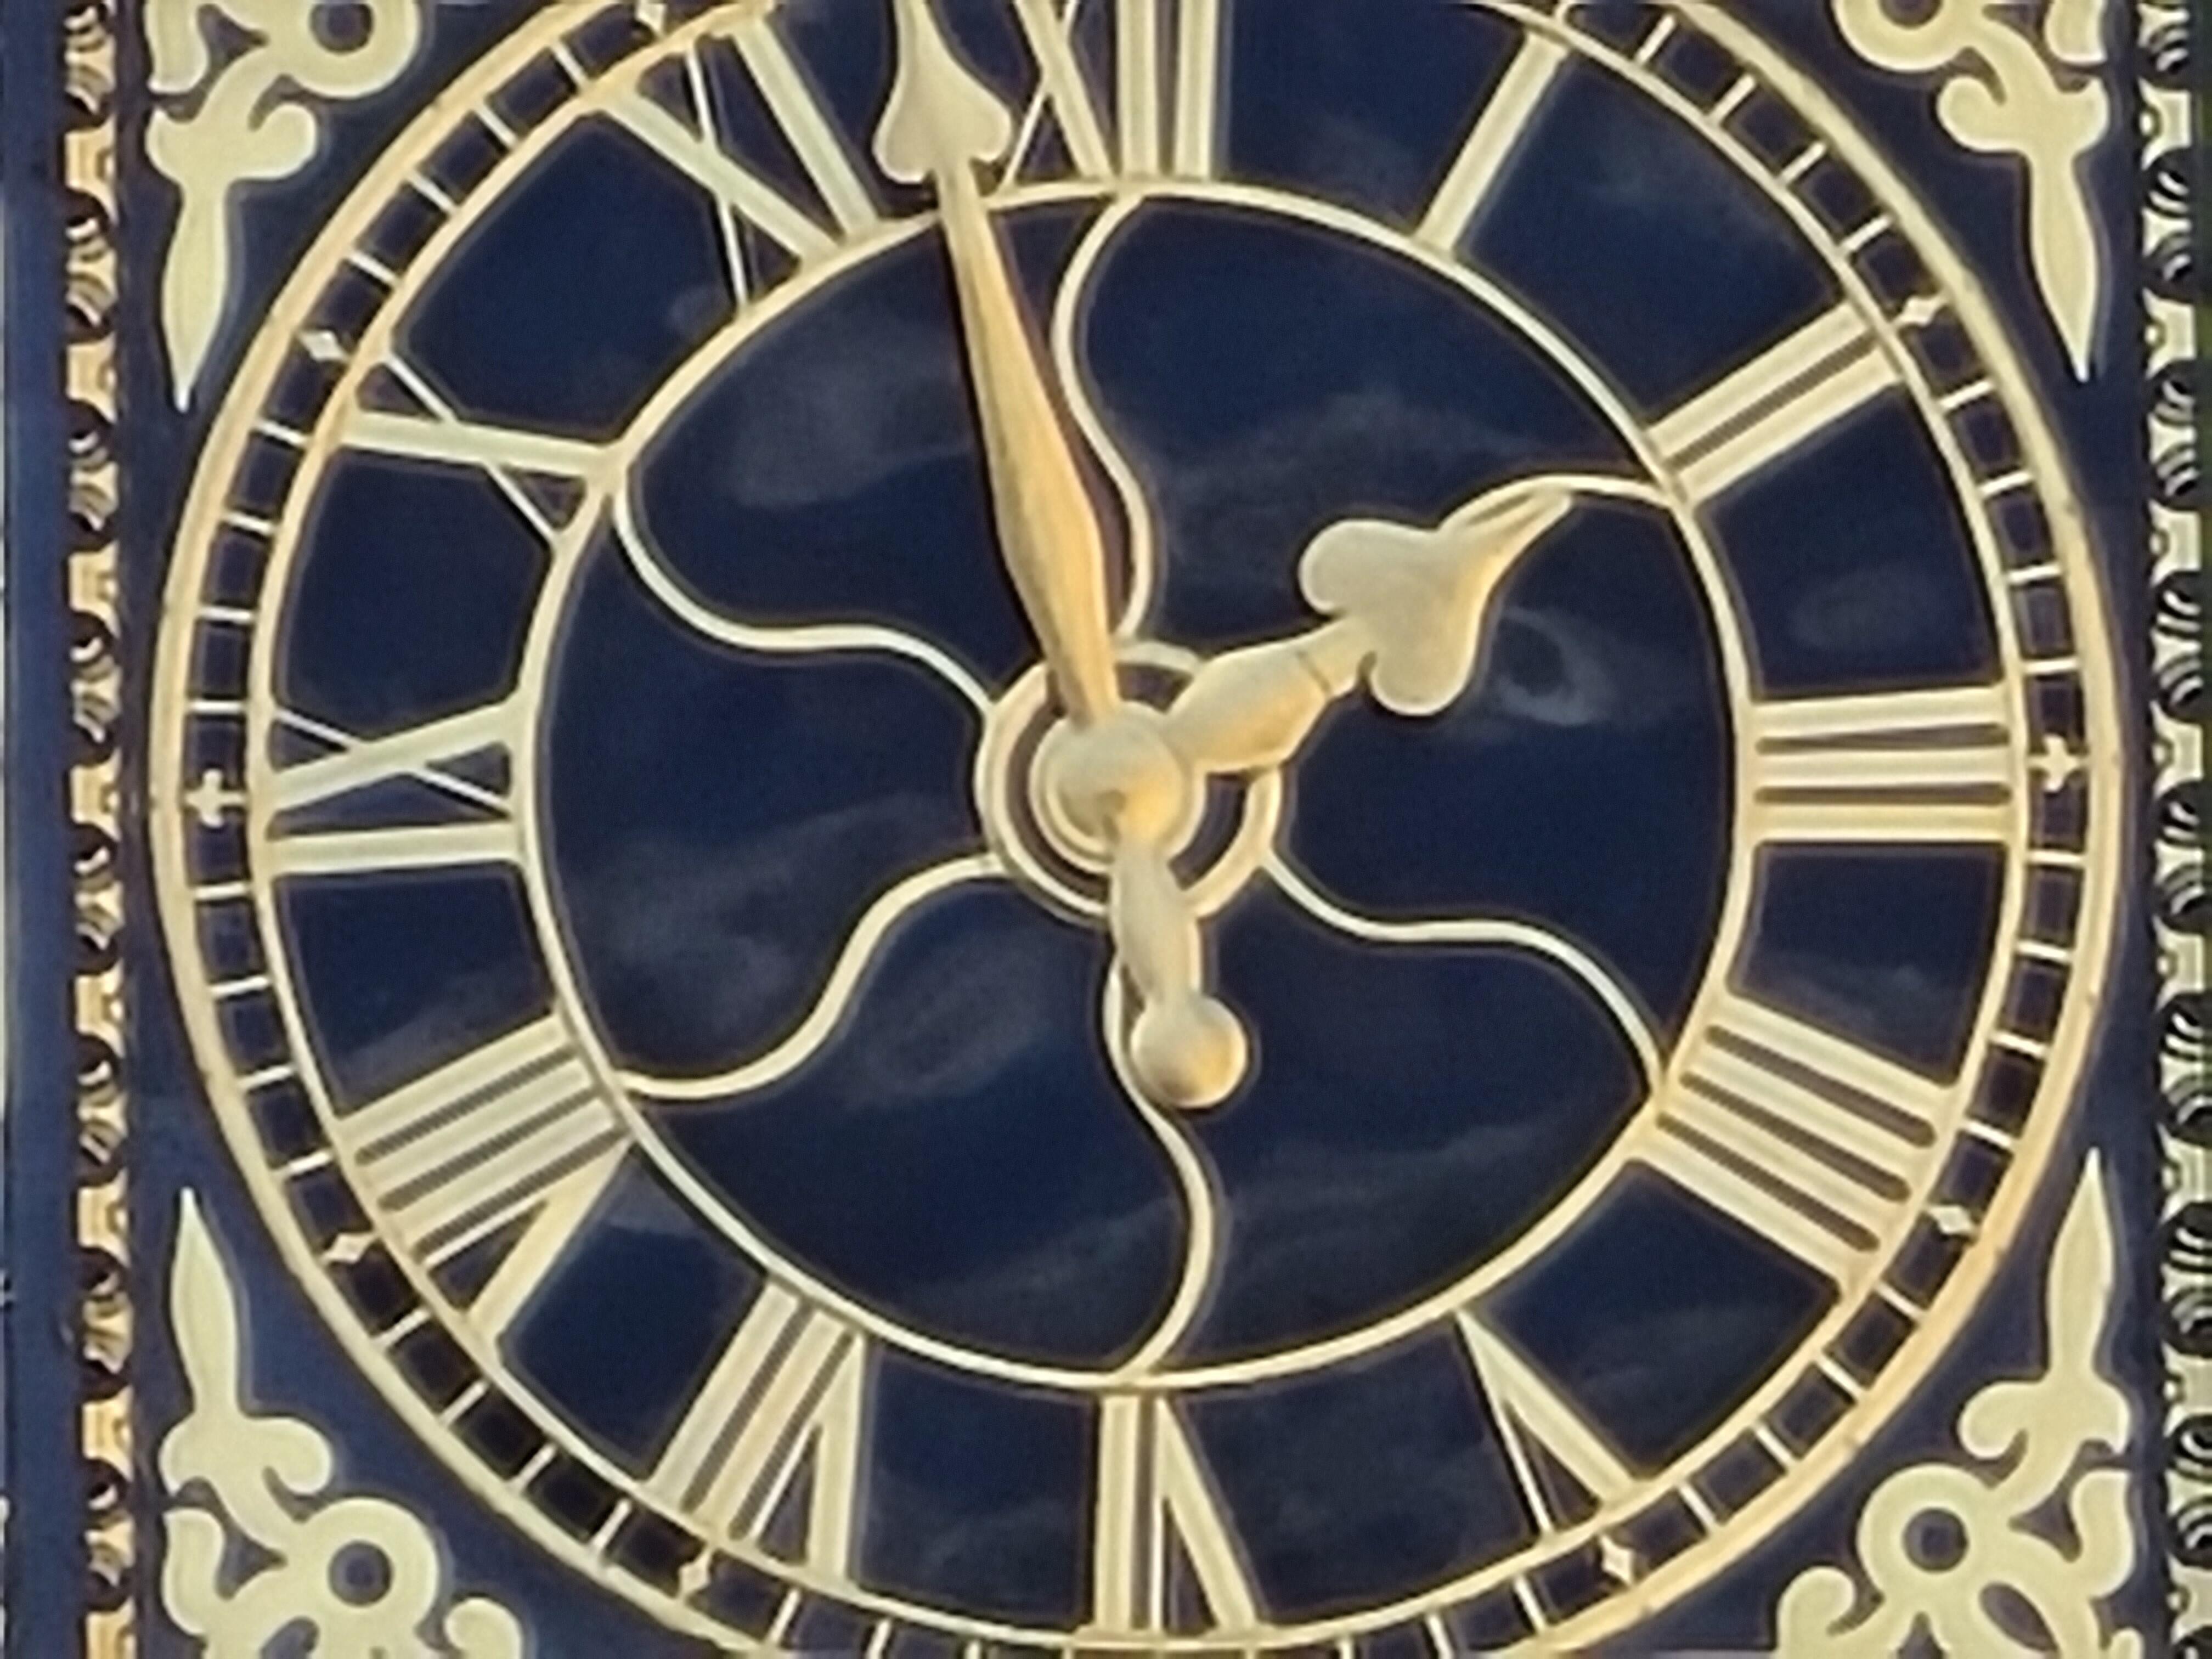 guildford-clock-30x